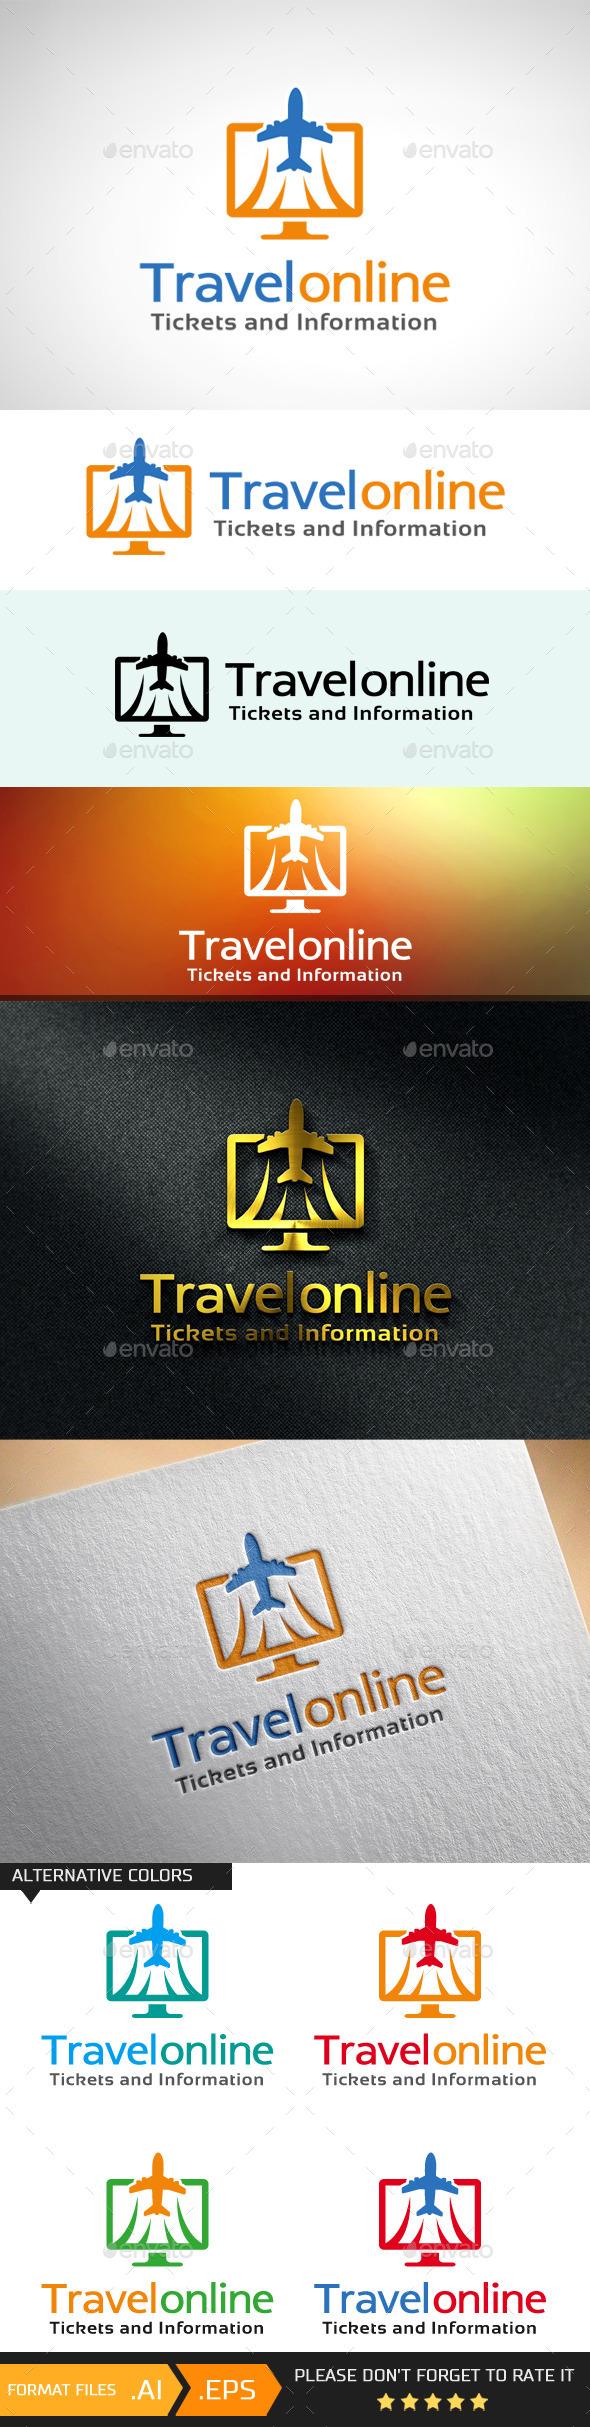 Travel Online Ticket & Info Logo Template - Objects Logo Templates